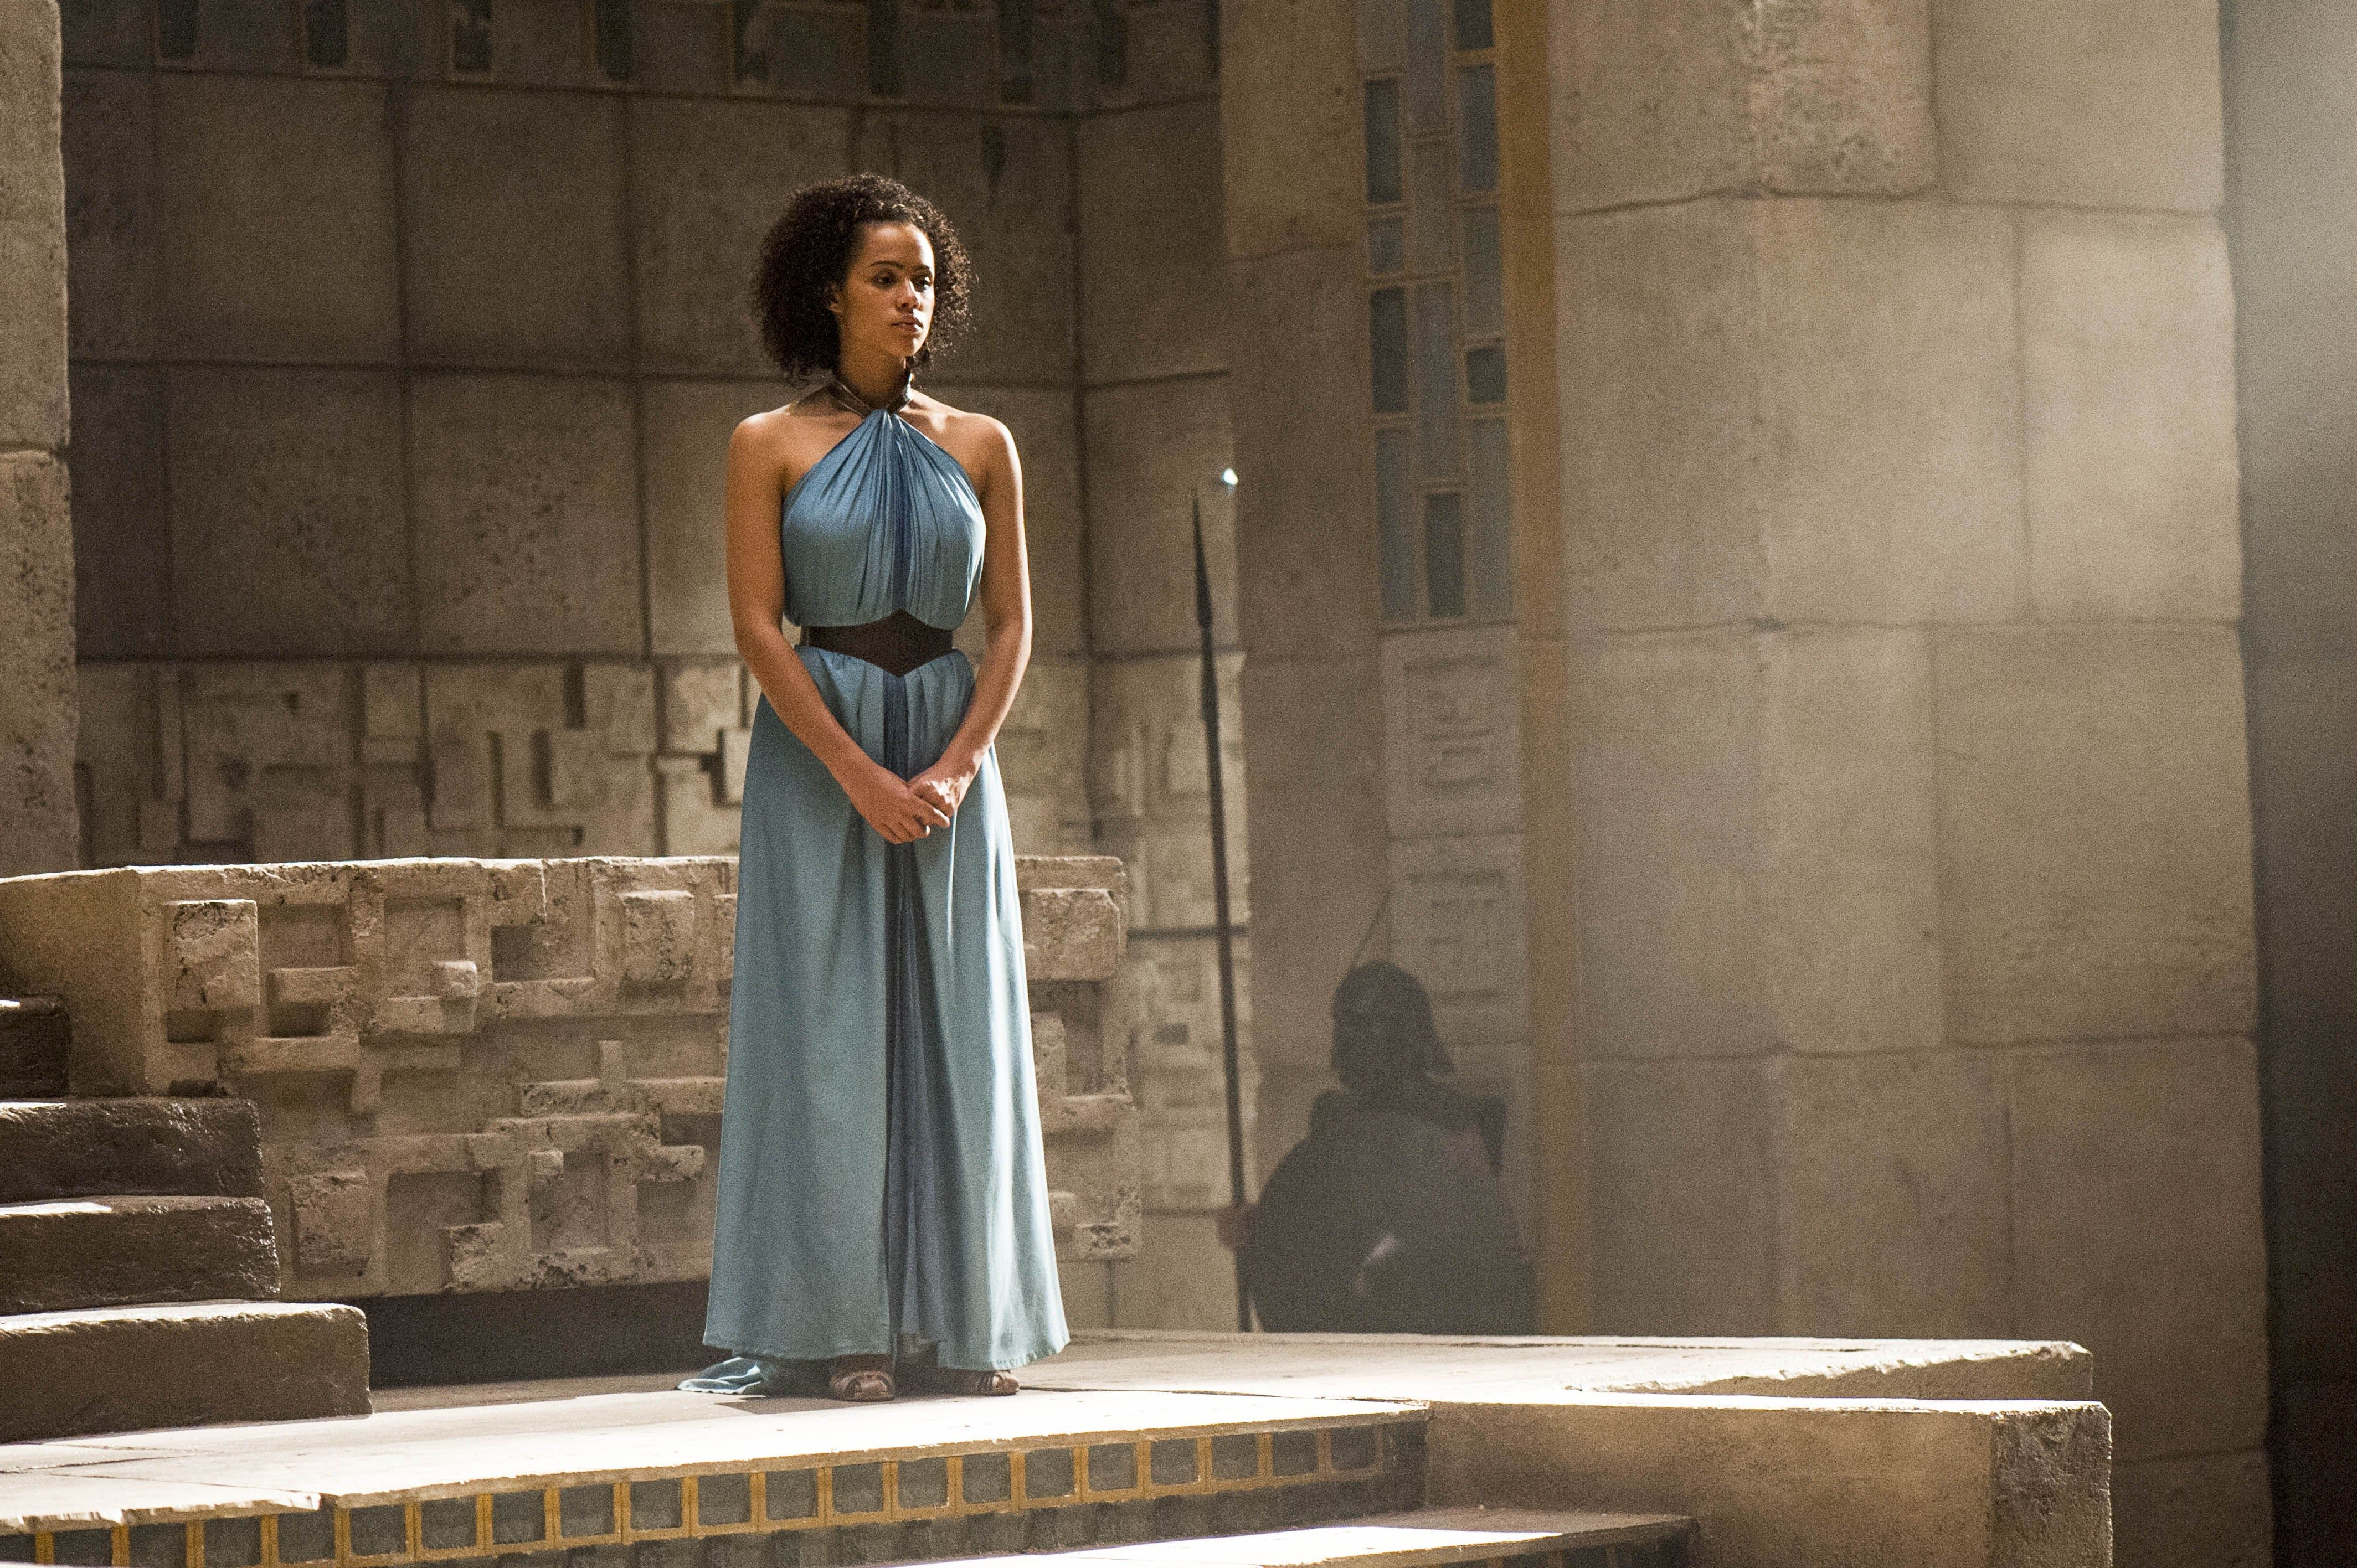 missandei (nathalie emmanuel) Missandei Game of Thrones #Missandei #WhiteWalkersGOT #WhiteWalkersNET